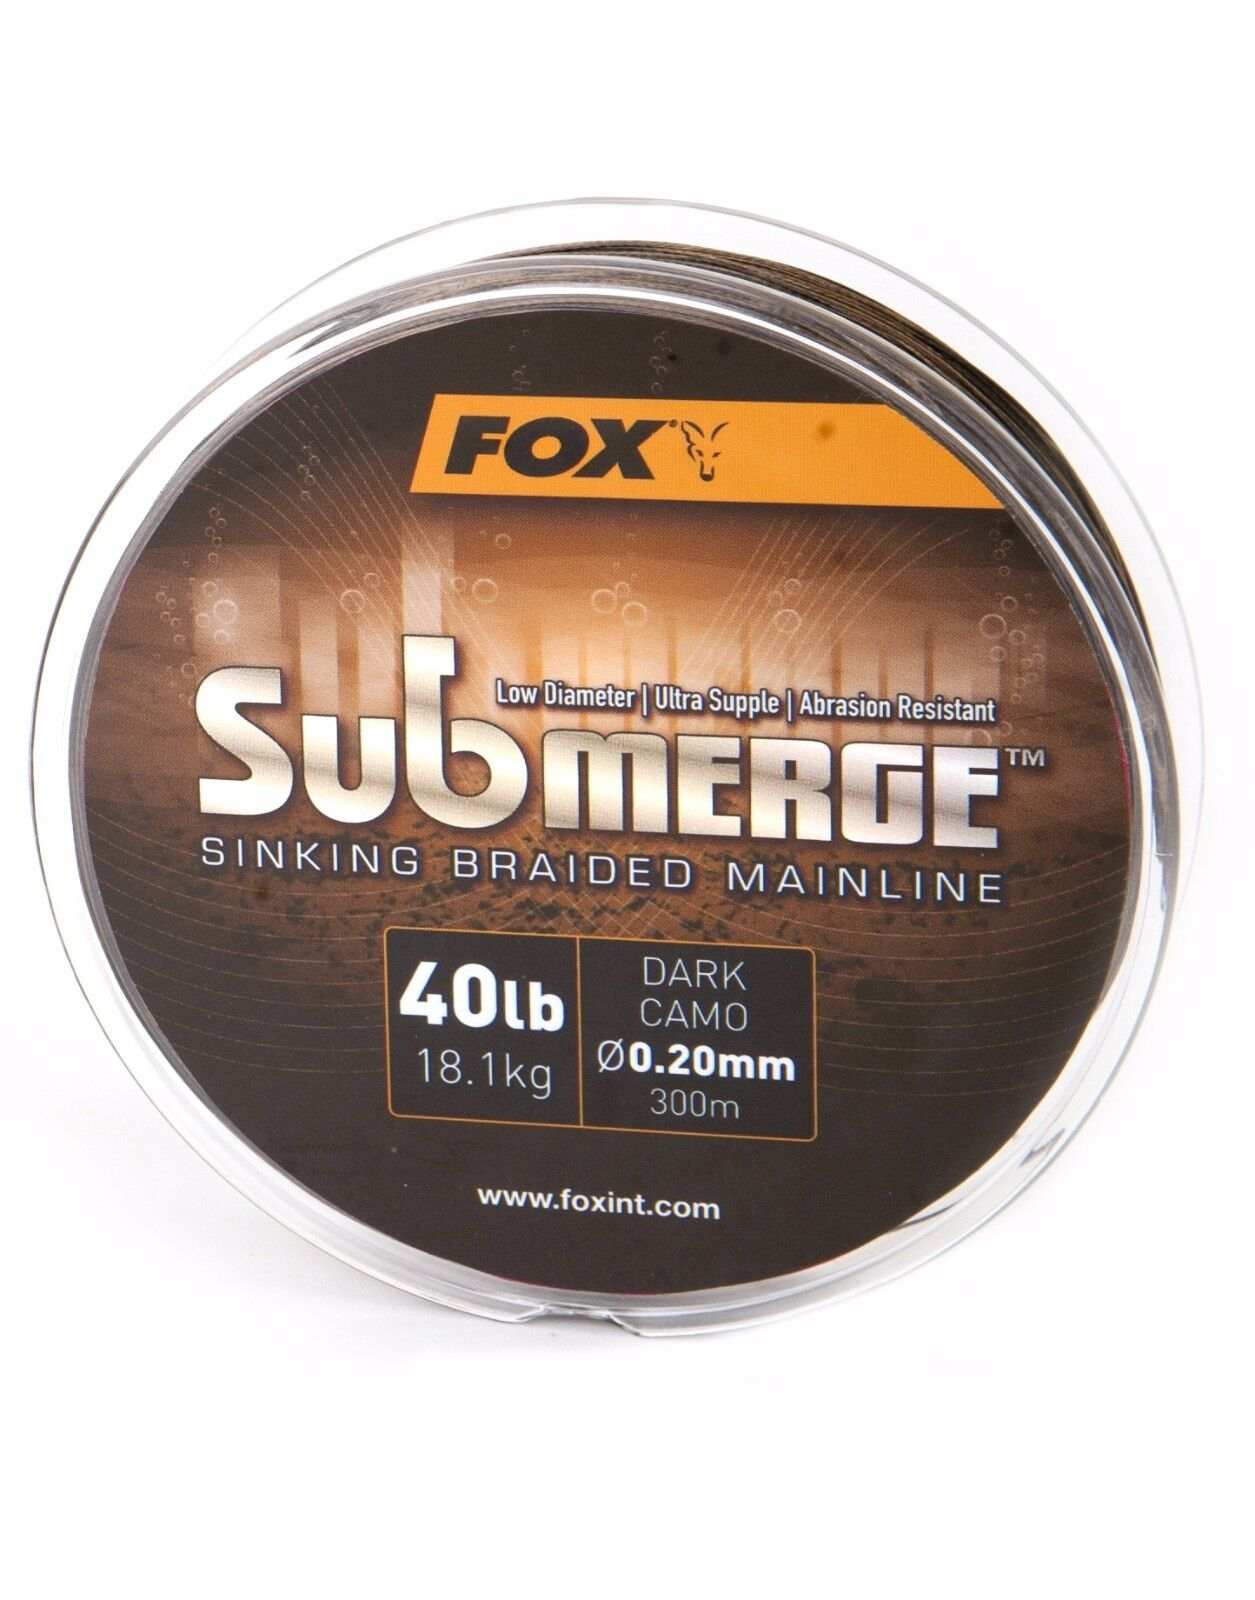 FOX SUBMERGE SINKING BRAID   BRAIDED LINE - 300M & 600M - ALL BREAKING STRENGTHS